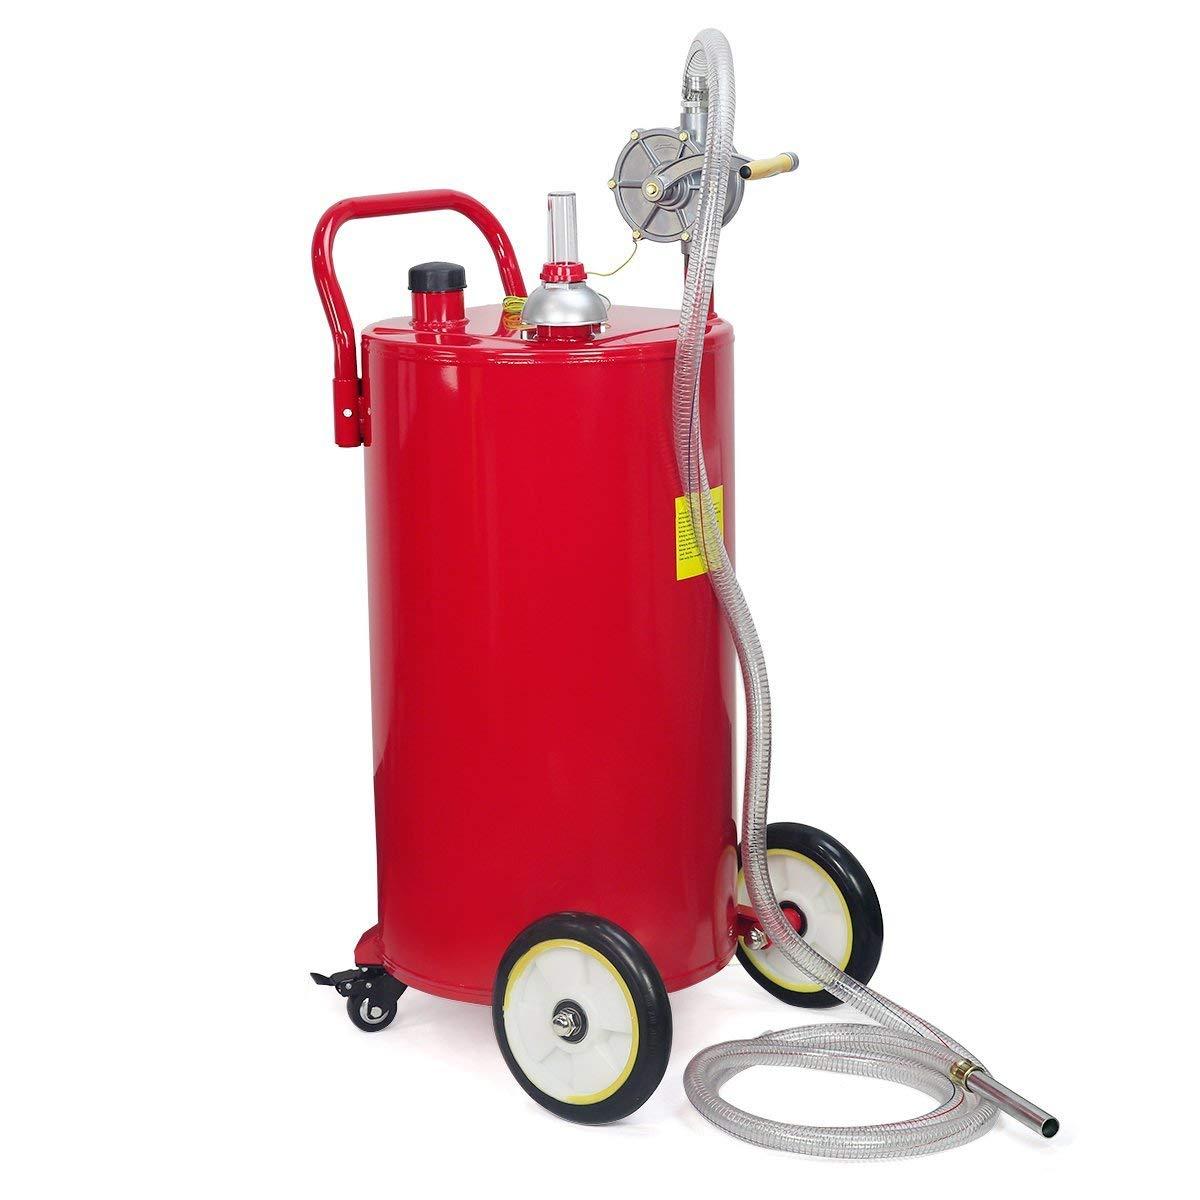 STKUSA 35-Gallon Portable Fuel Transfer Gas Can Caddy Storage Tank 35gal-Capacity Pump w/Wheel by STKUSA (Image #1)